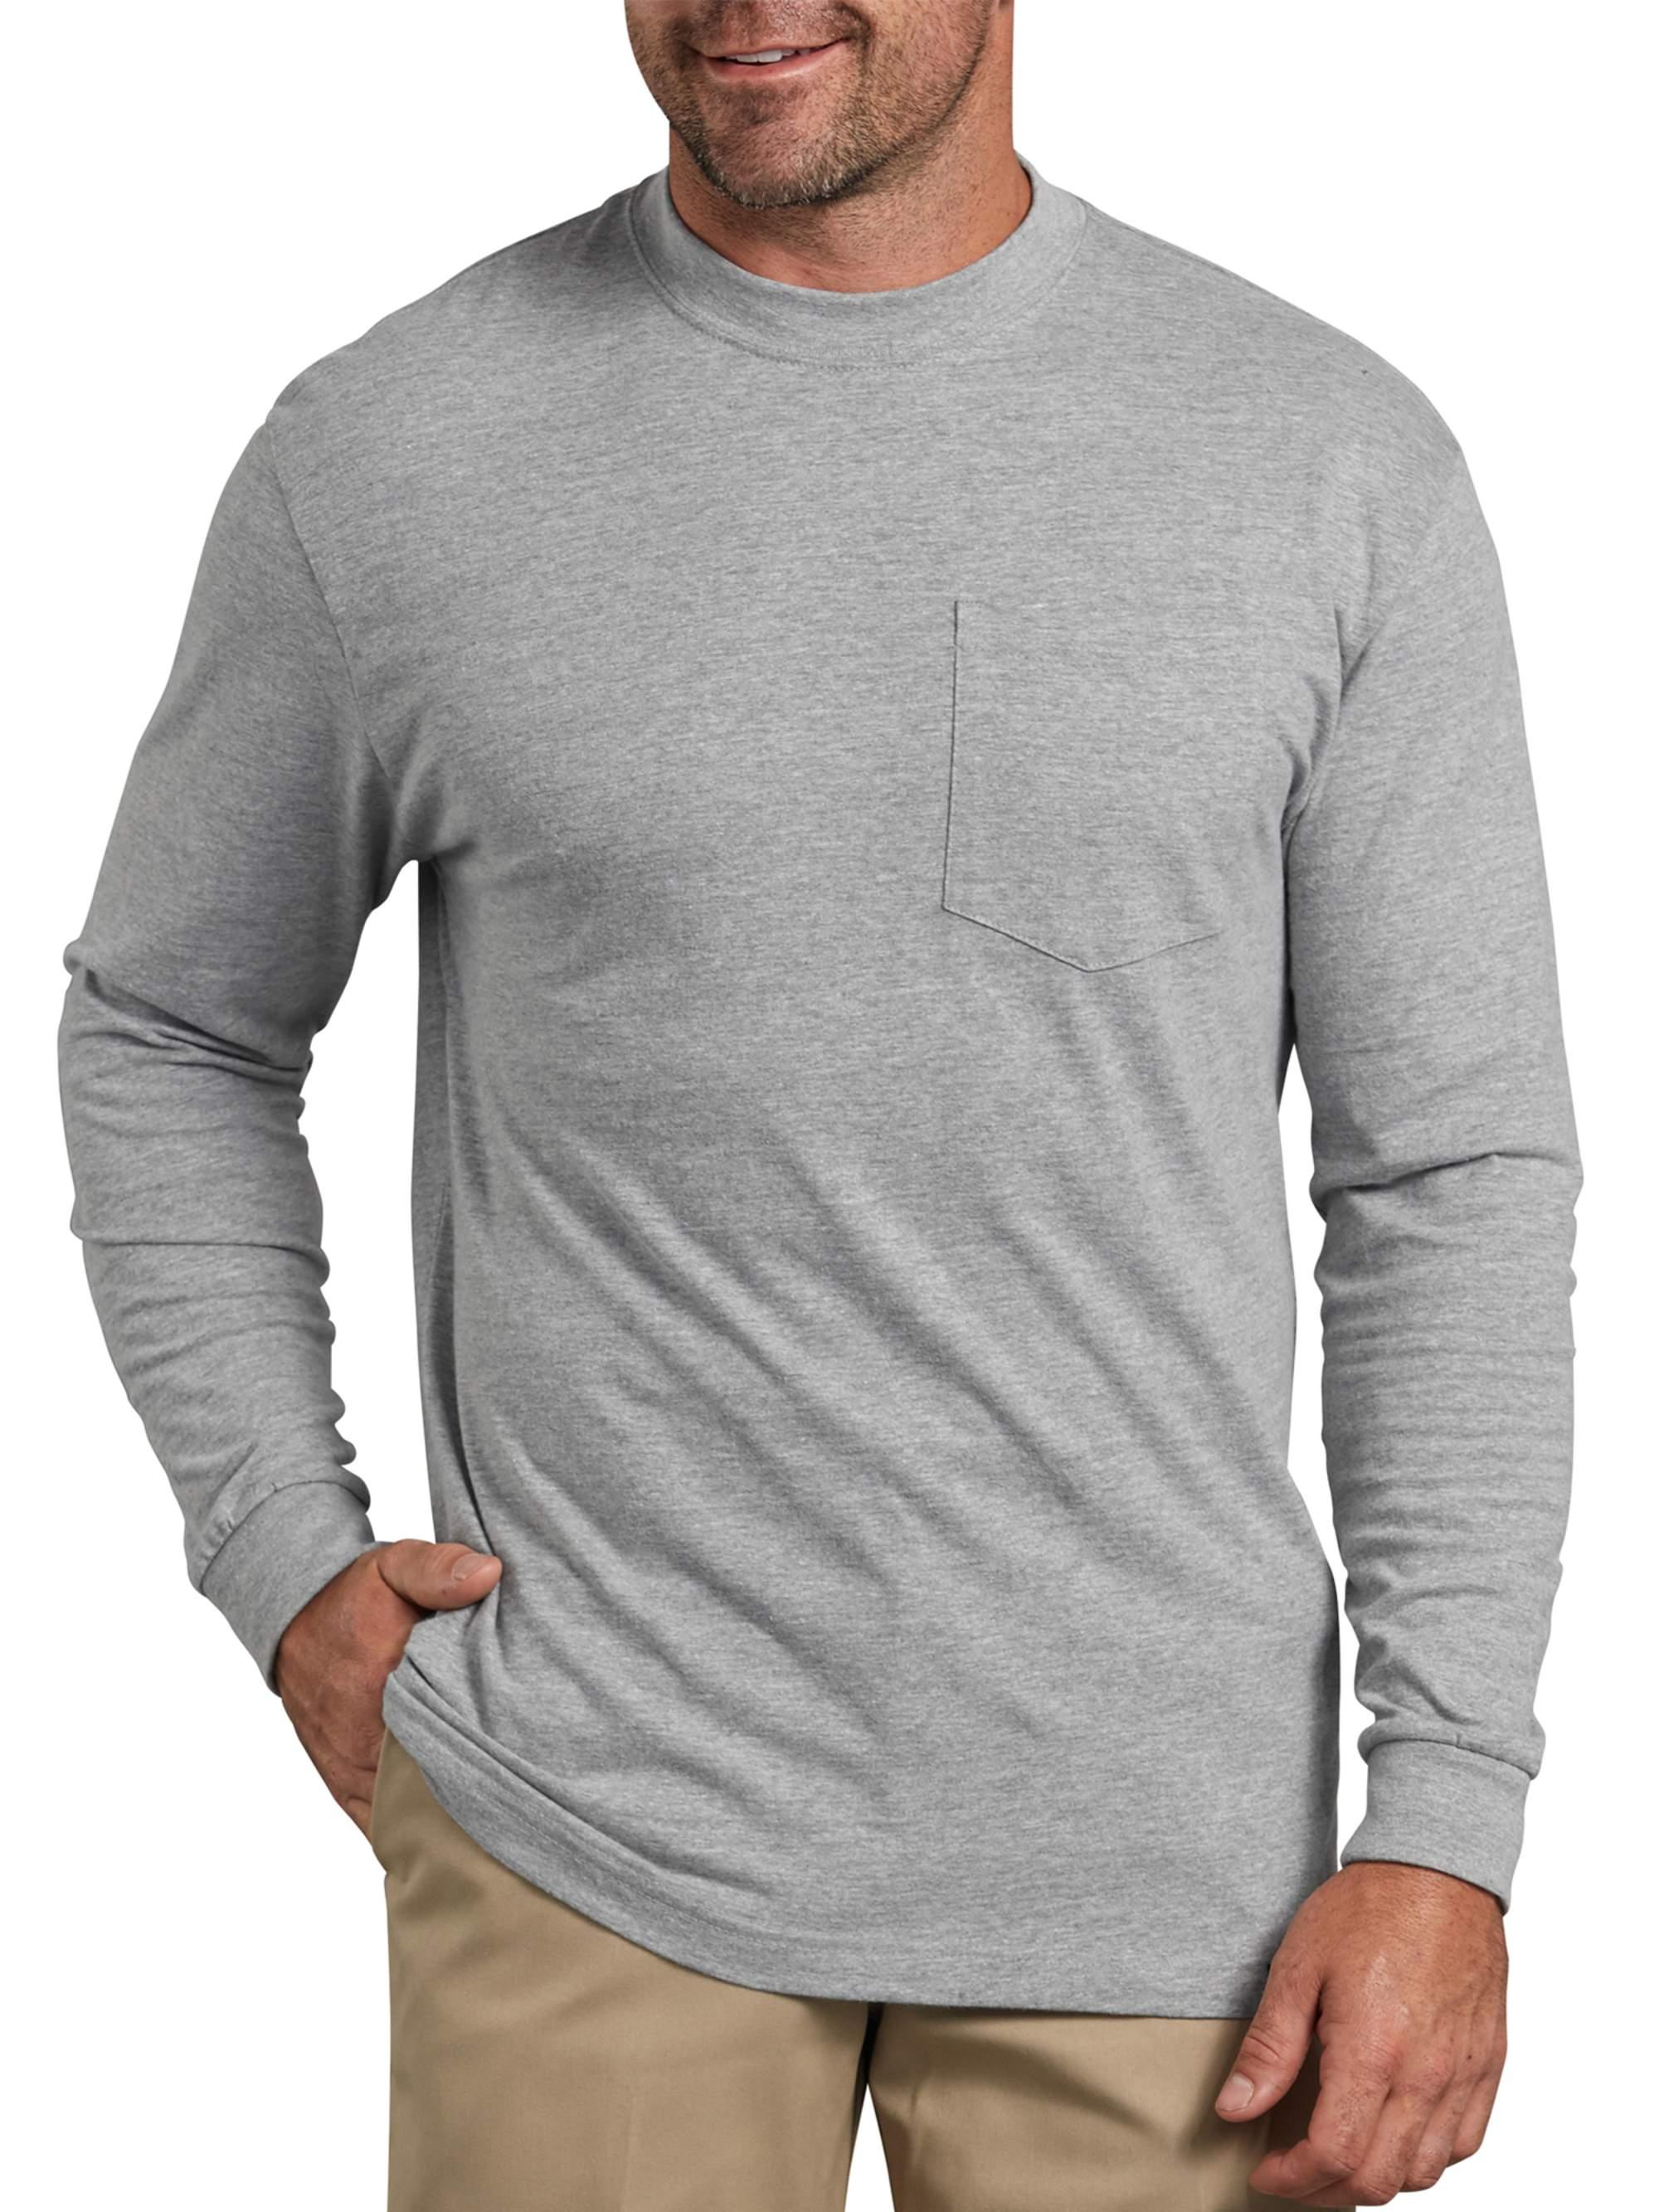 Big Men's Heavy Weight Long Sleeve Pocket T-Shirt, 2-Pack